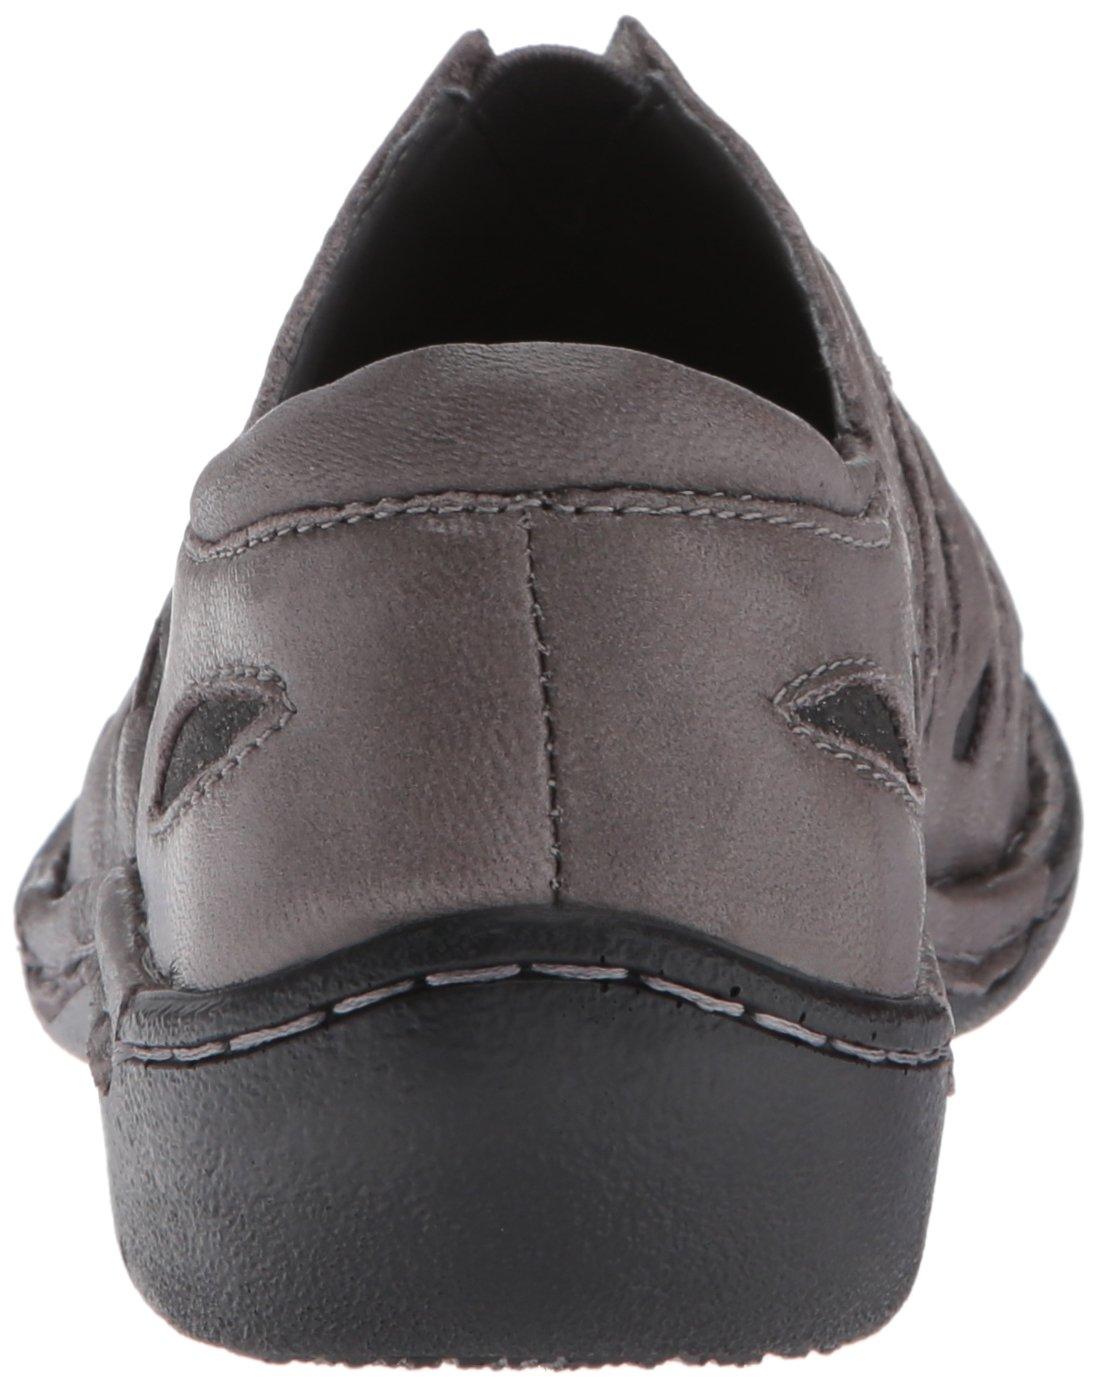 Propet Women's Cameo Flat B01MRRZ88B US|Grey/Pewter 7.5 2E US|Grey/Pewter B01MRRZ88B 64a73d